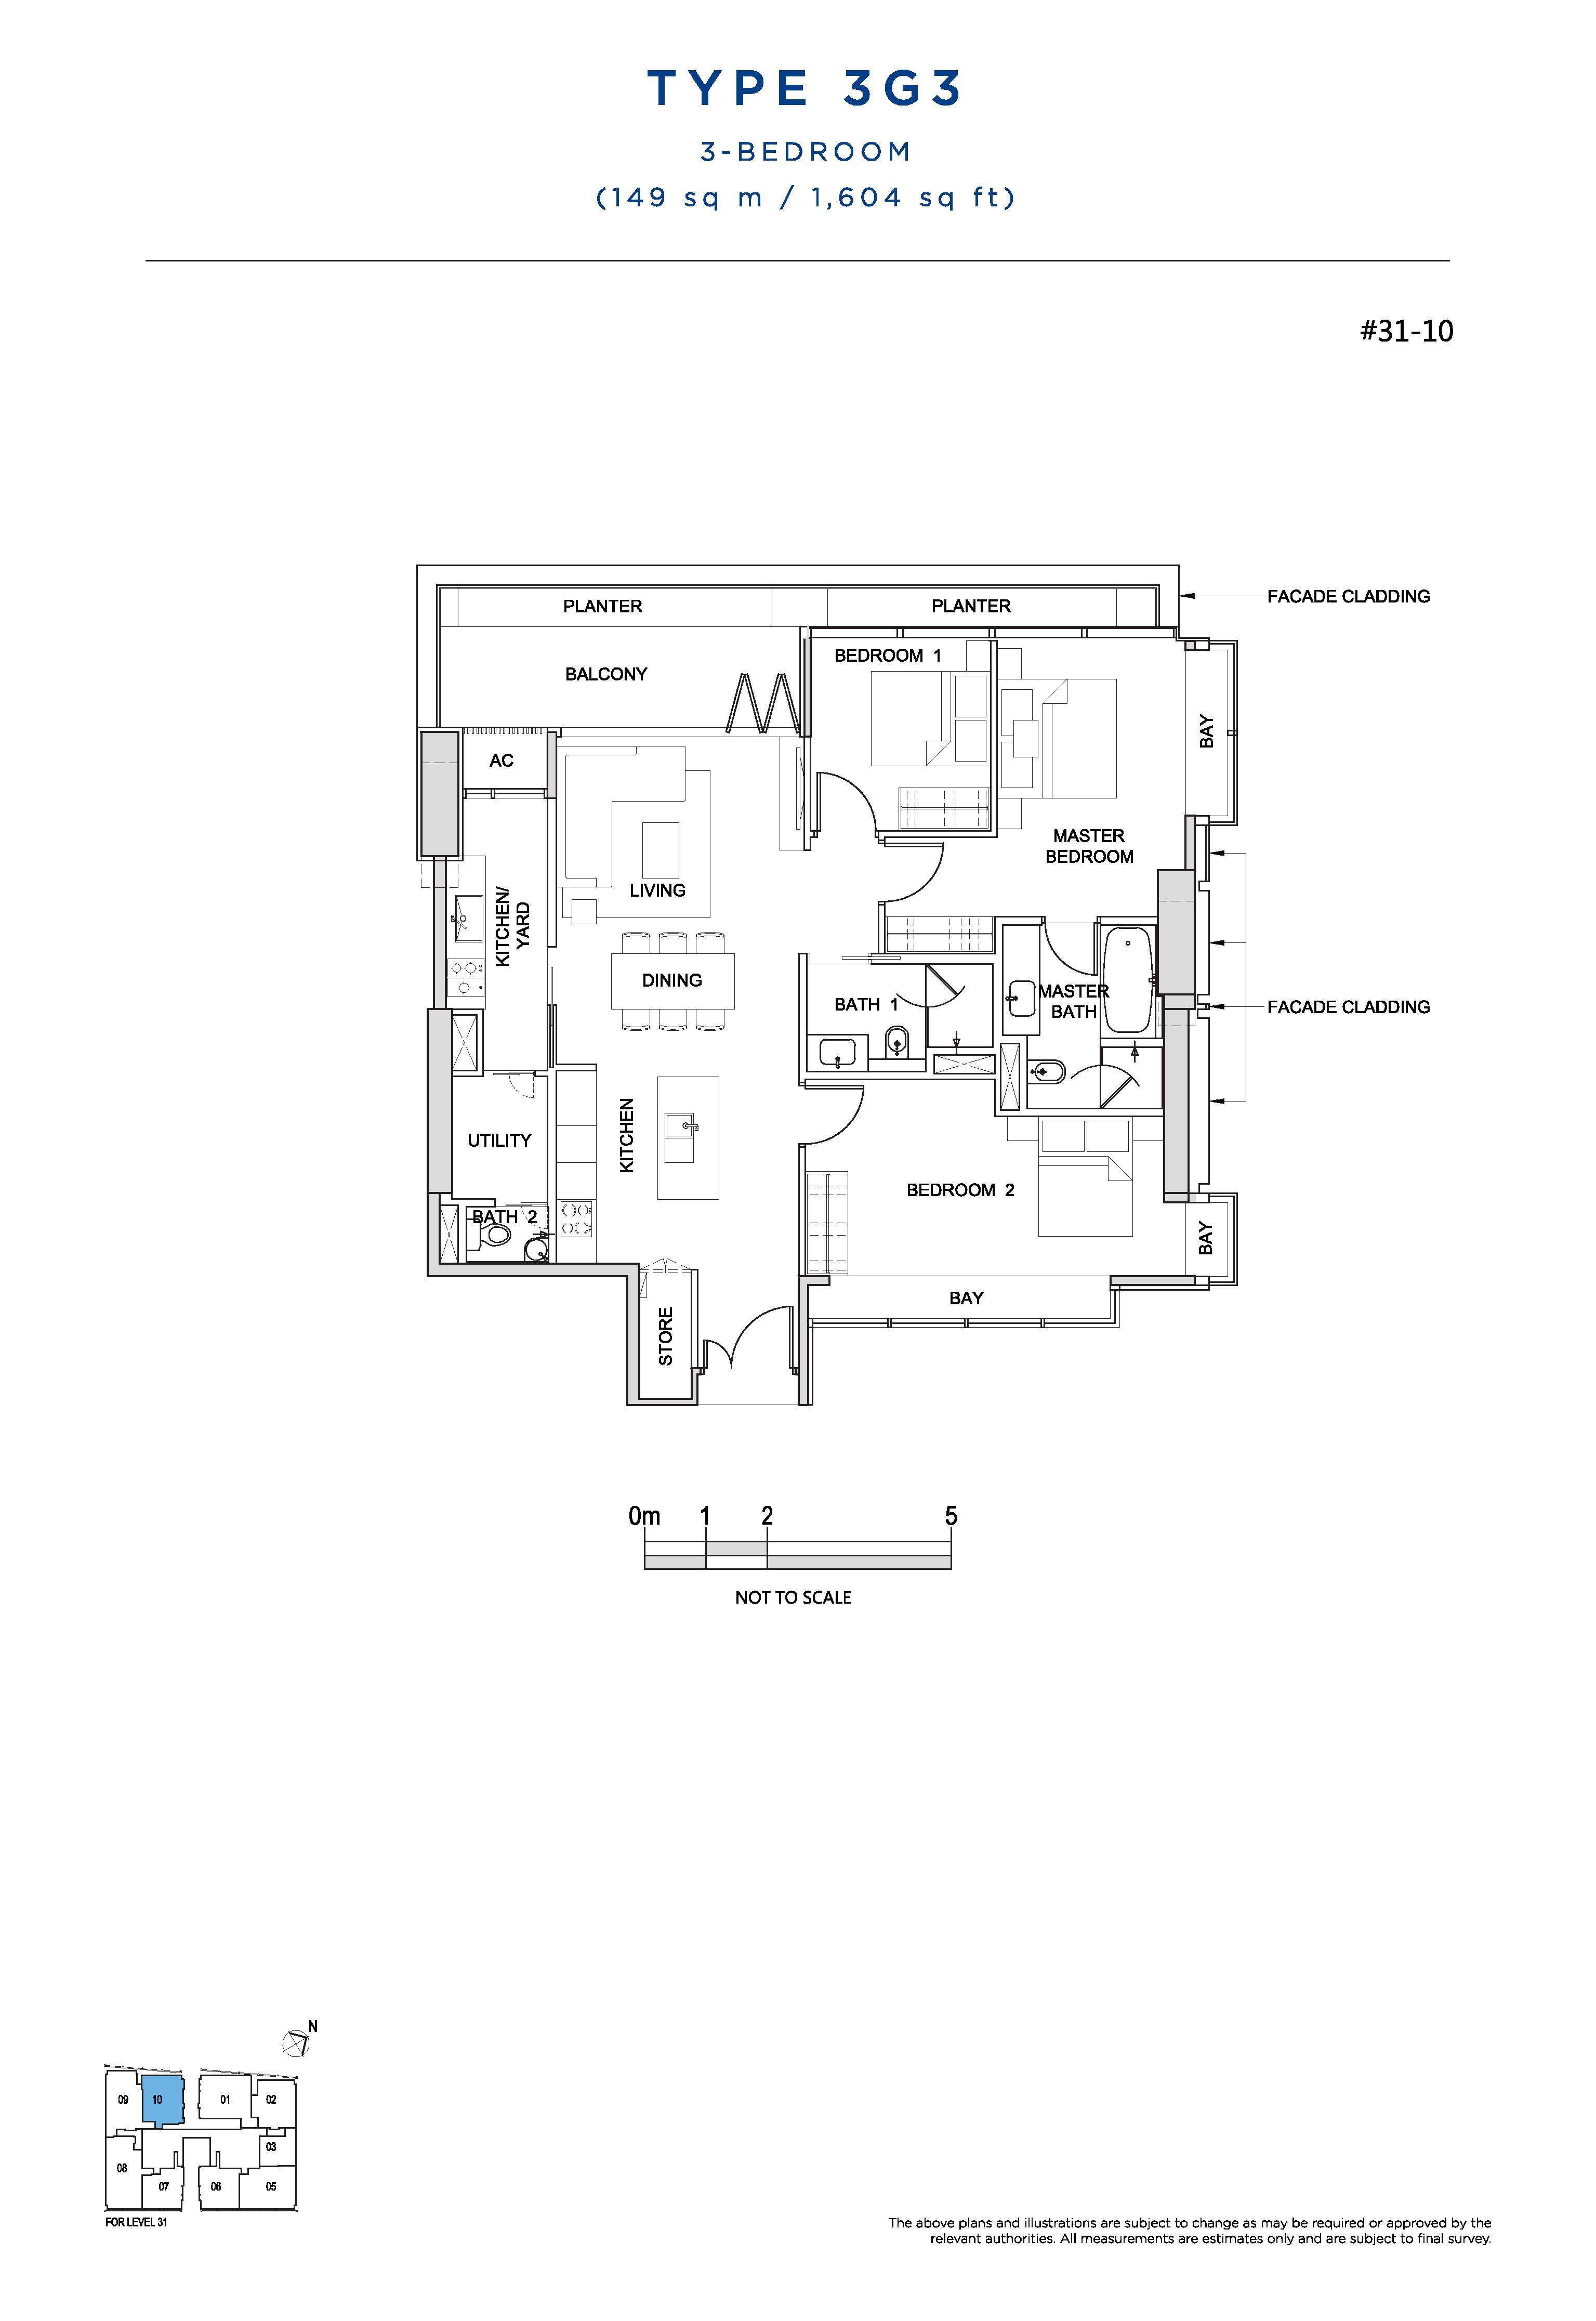 South Beach Residences 3 Bedroom Floor Plans Type 3G3